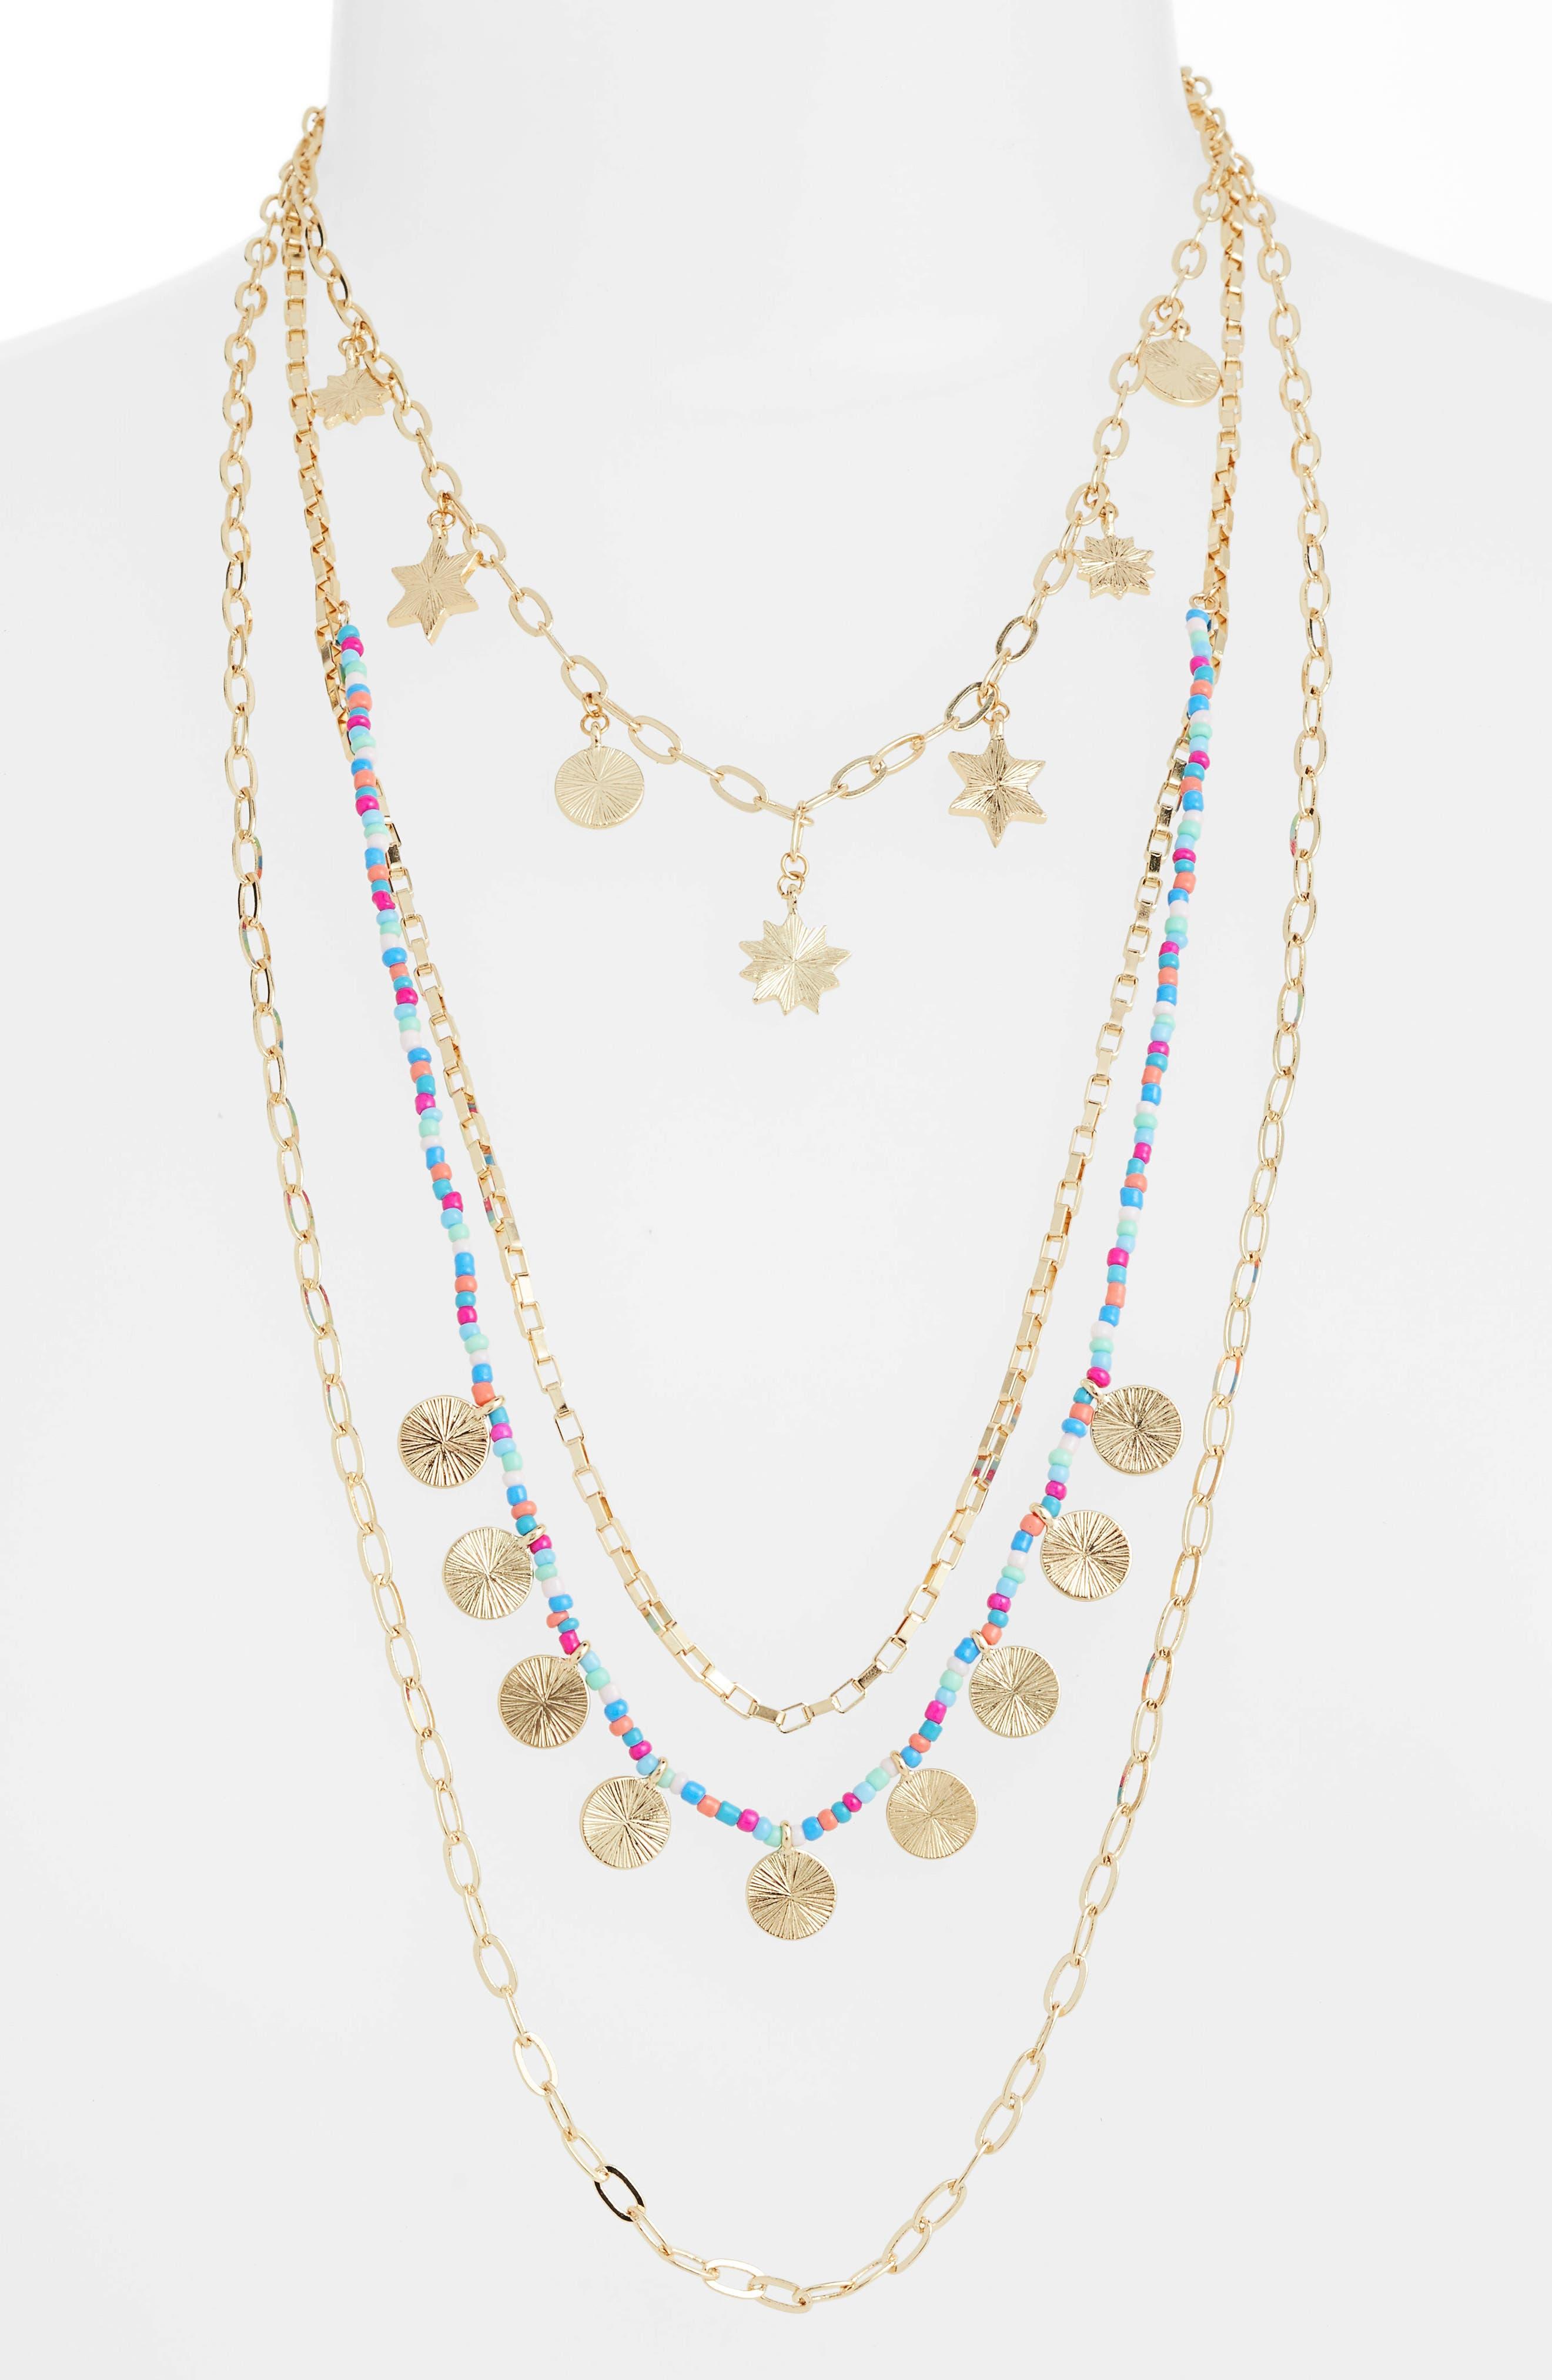 Sole Charm Statement Multistrand Necklace,                         Main,                         color, Bright Multi/ Gold